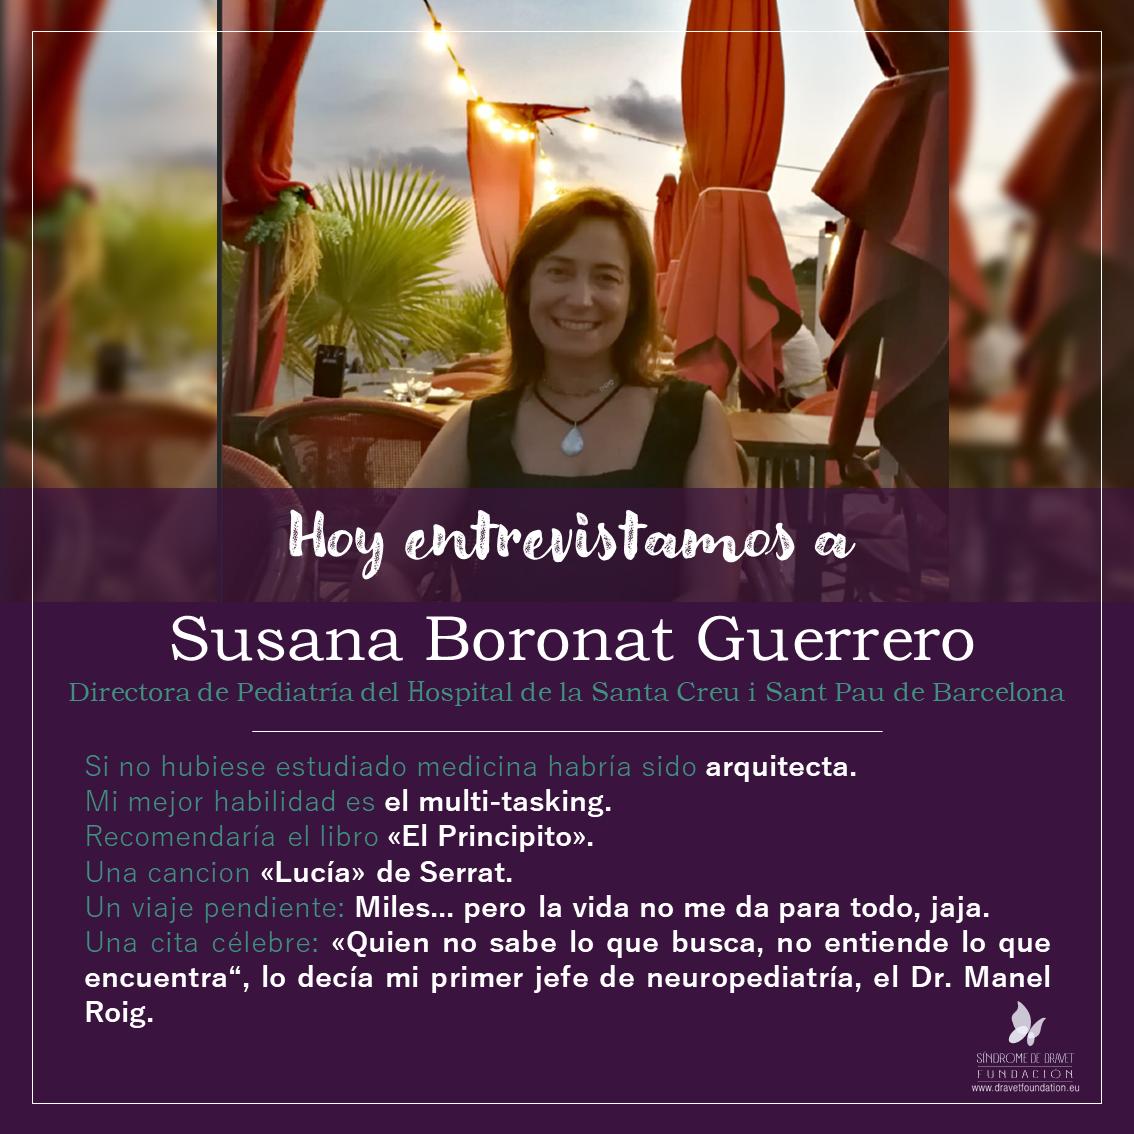 Entrevistamos a Susana Boronat Guerrero